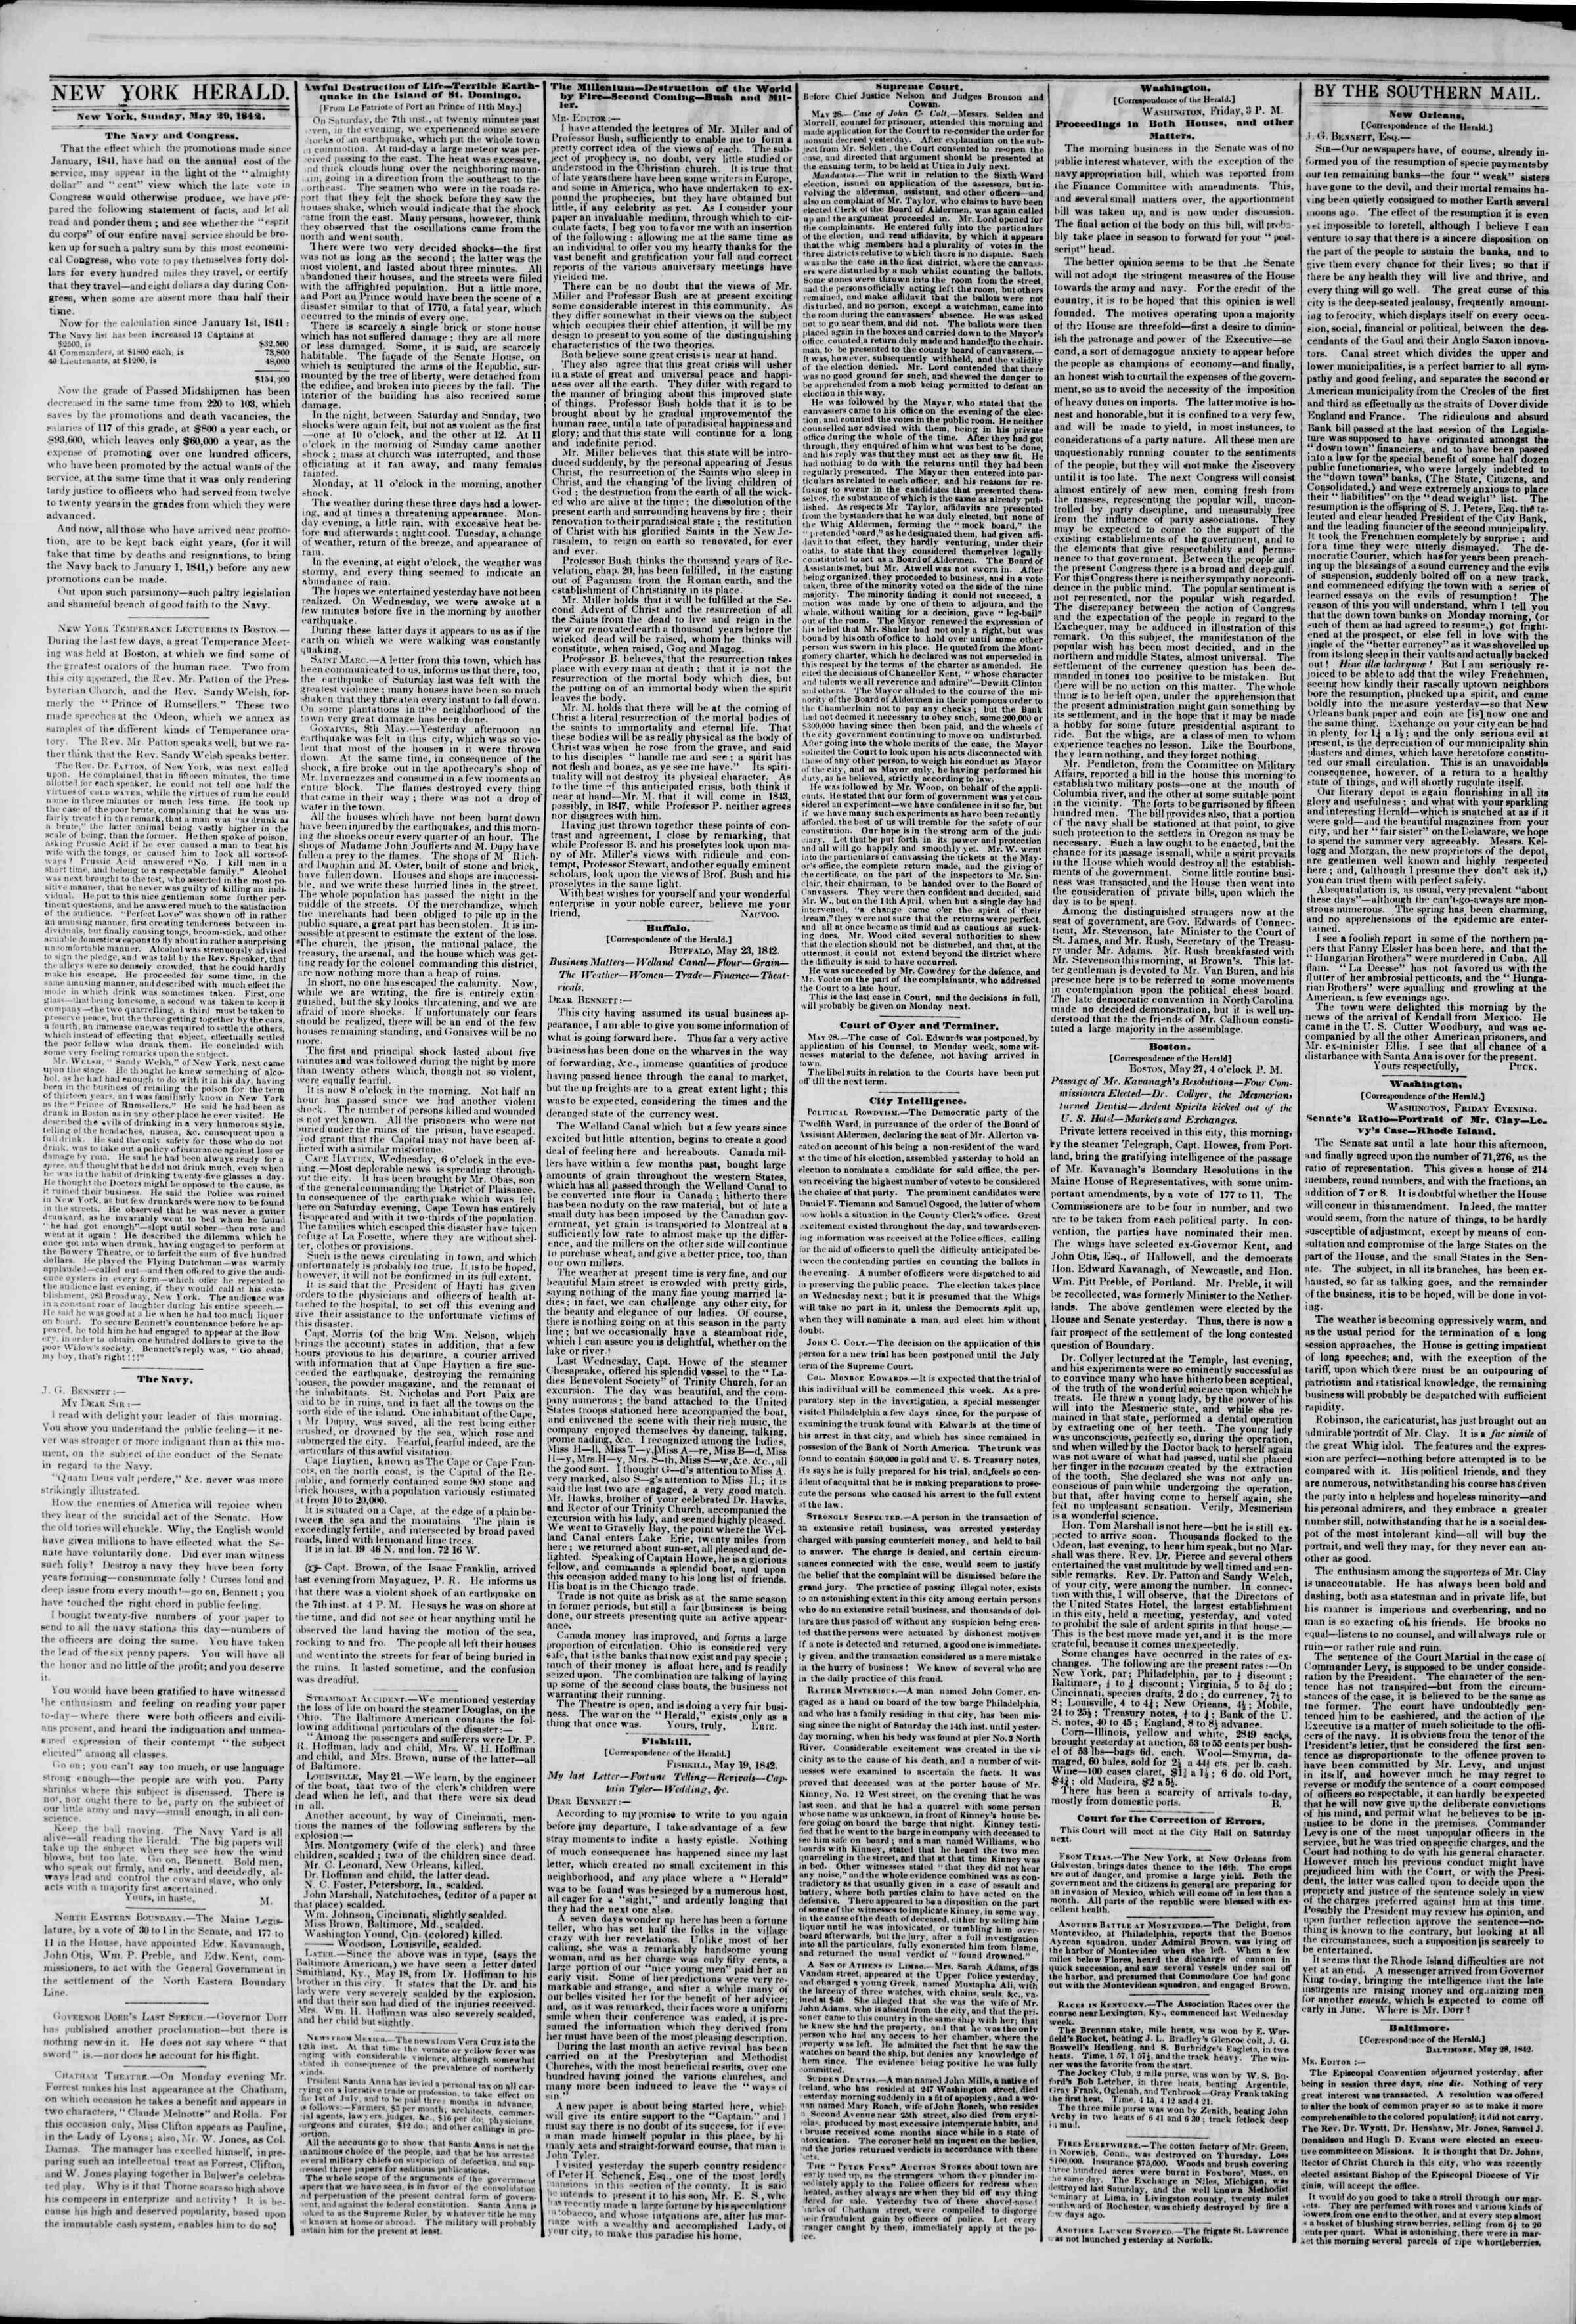 May 29, 1842 Tarihli The New York Herald Gazetesi Sayfa 2